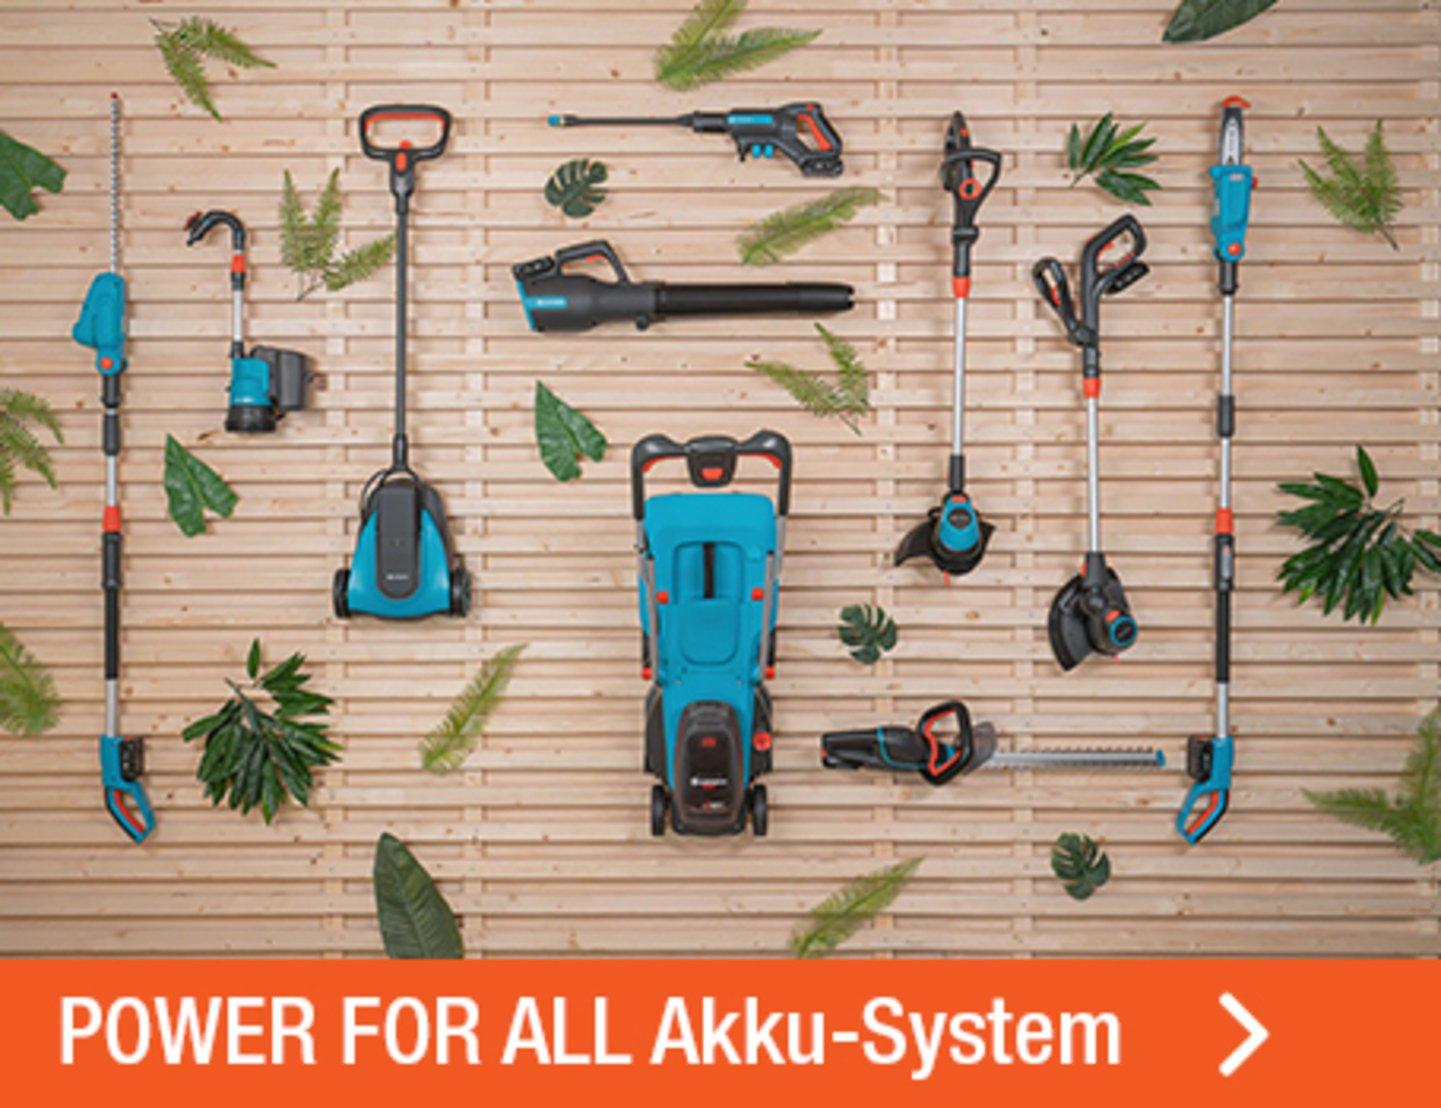 POWER FOR ALL Akku-System